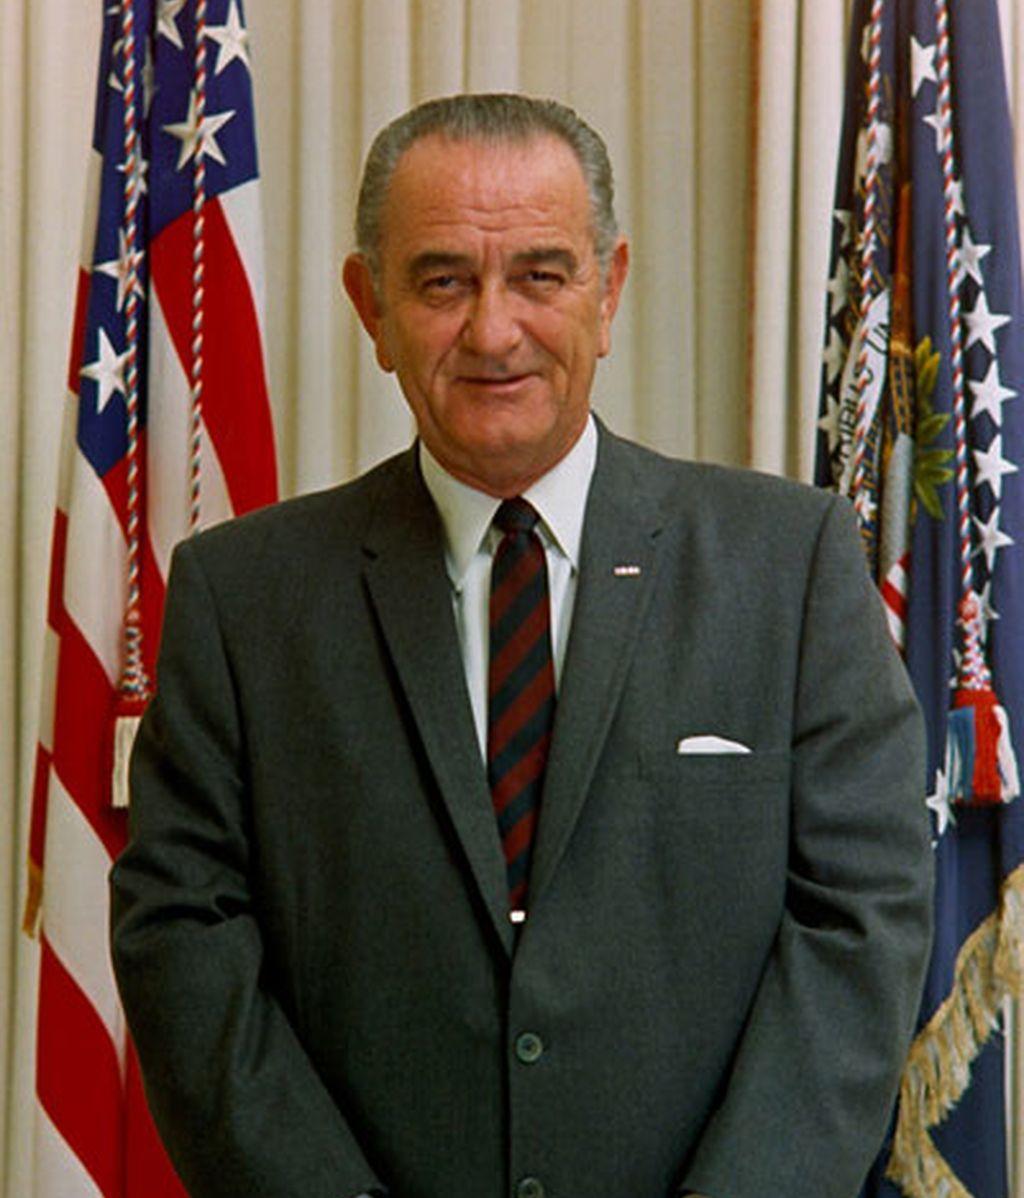 Lyndon B. Johnson (1963-1969)